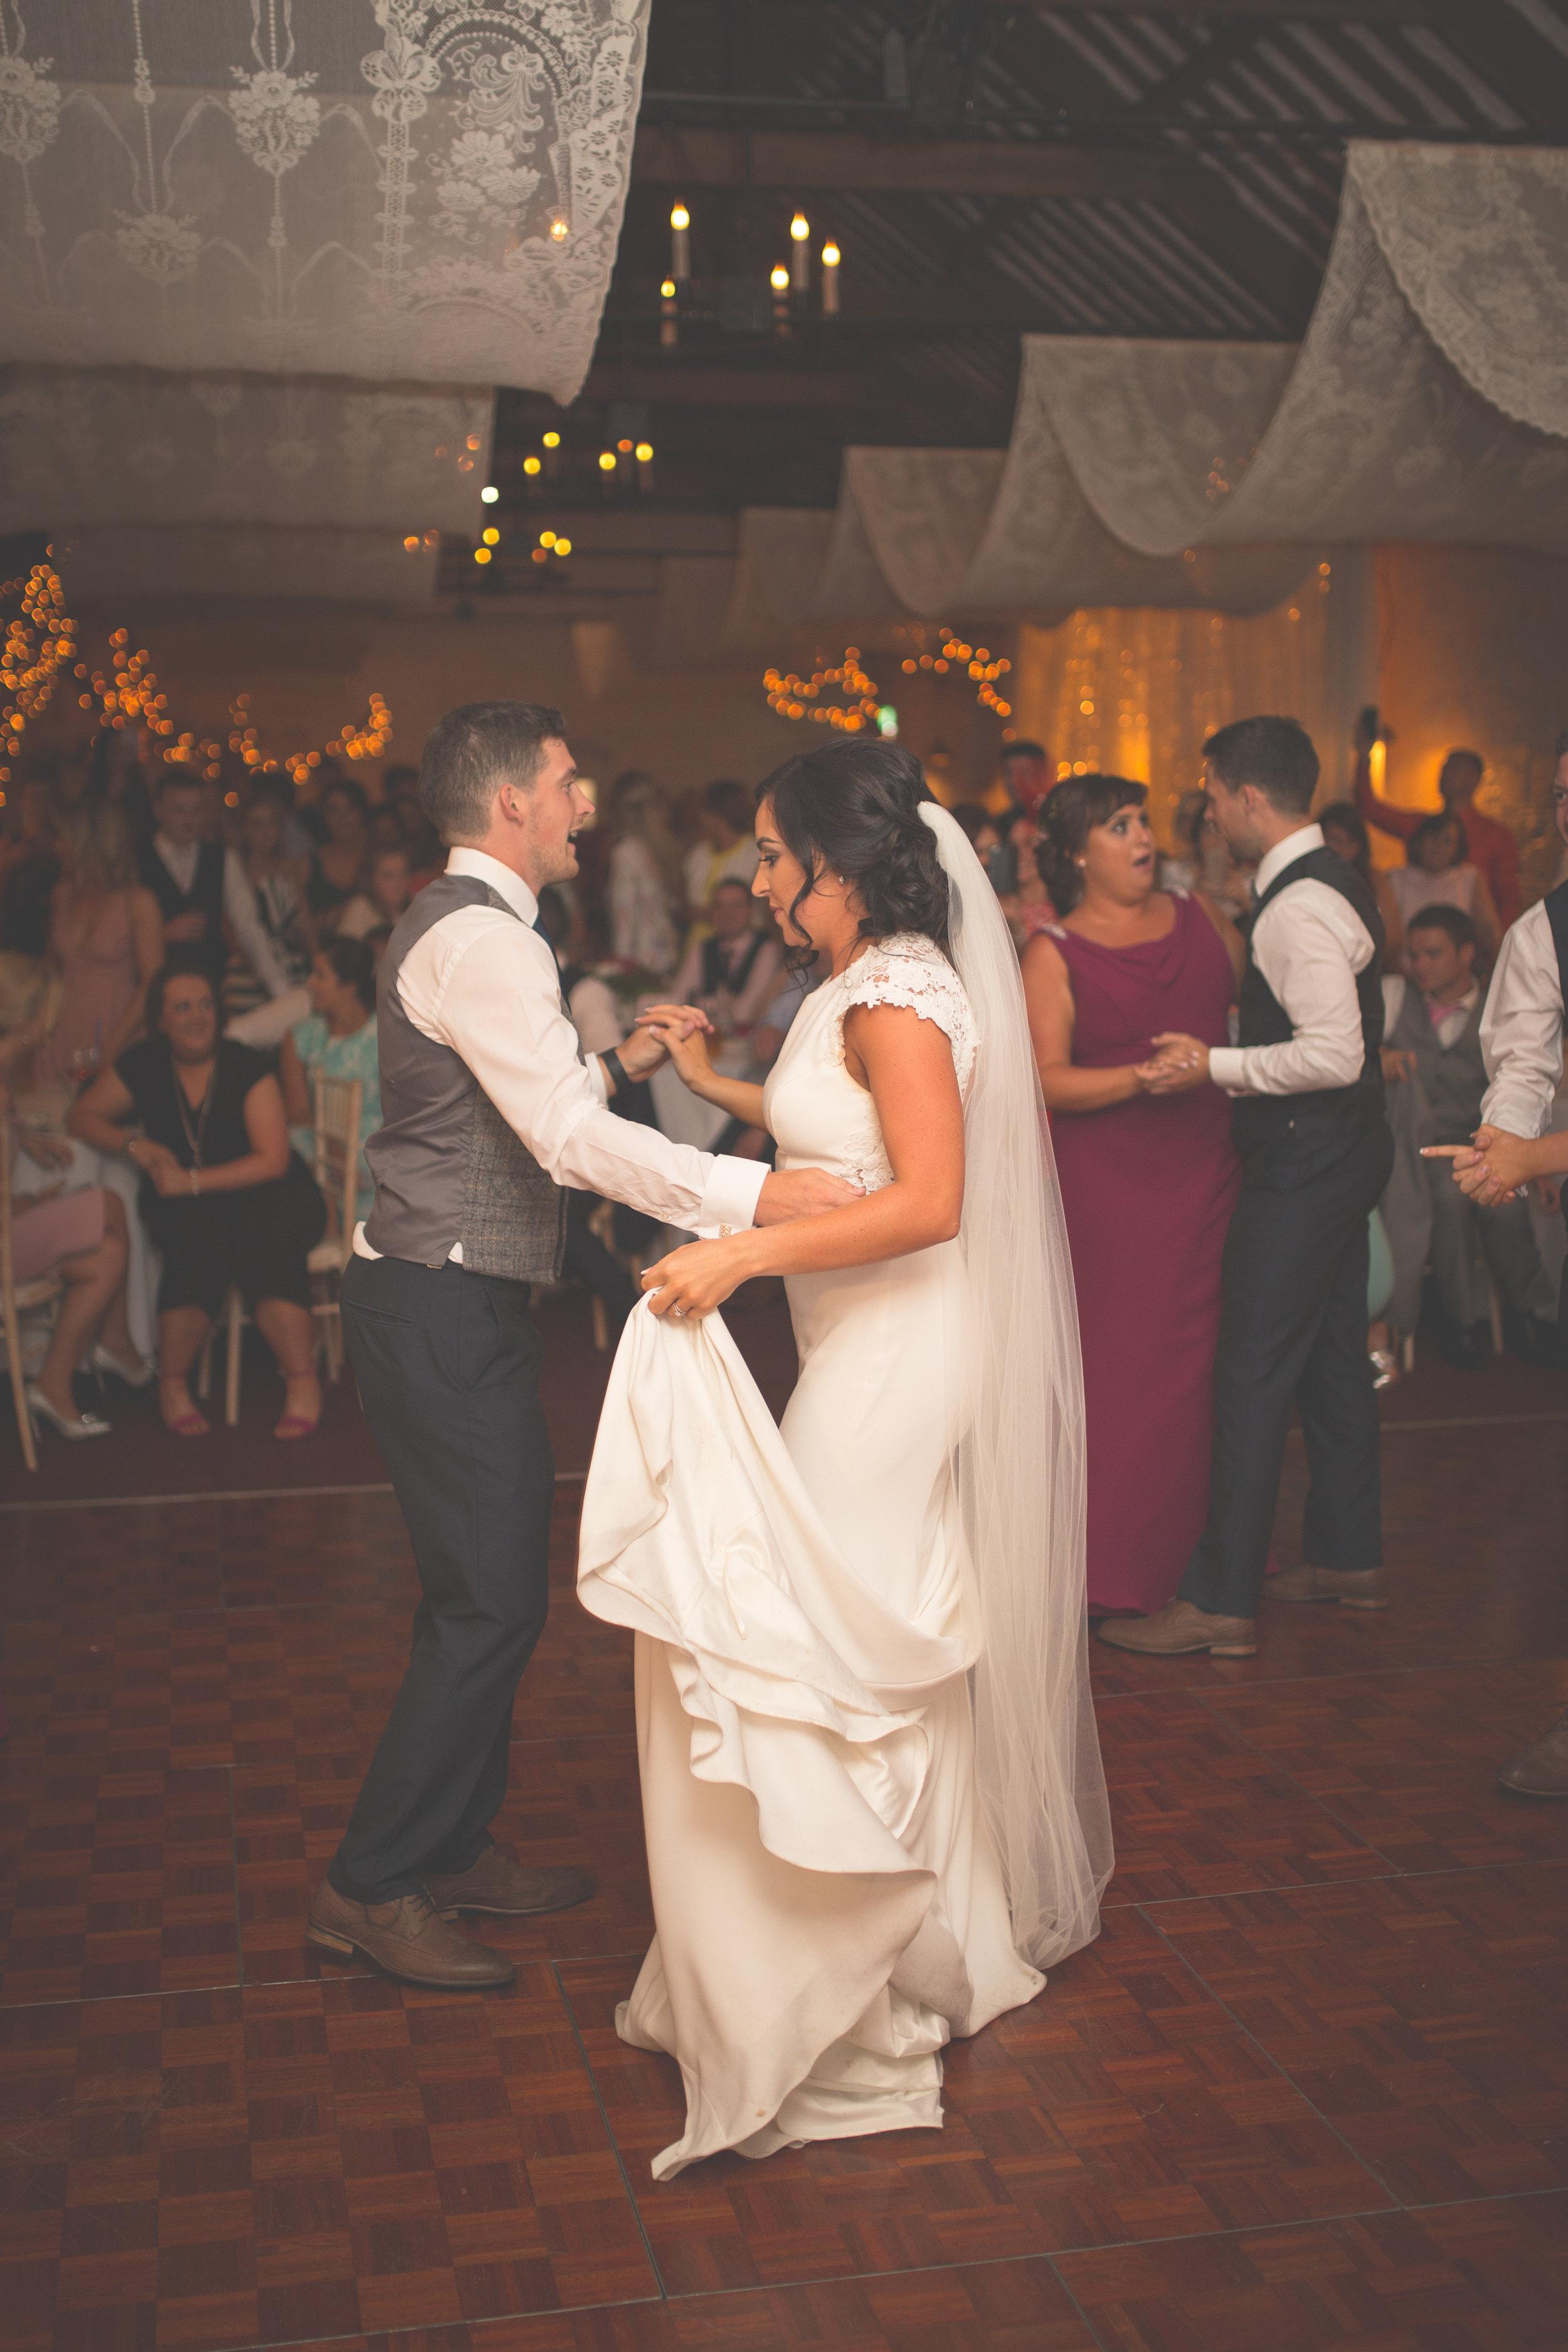 Brian McEwan Wedding Photography | Carol-Annee & Sean | The Dancing-33.jpg